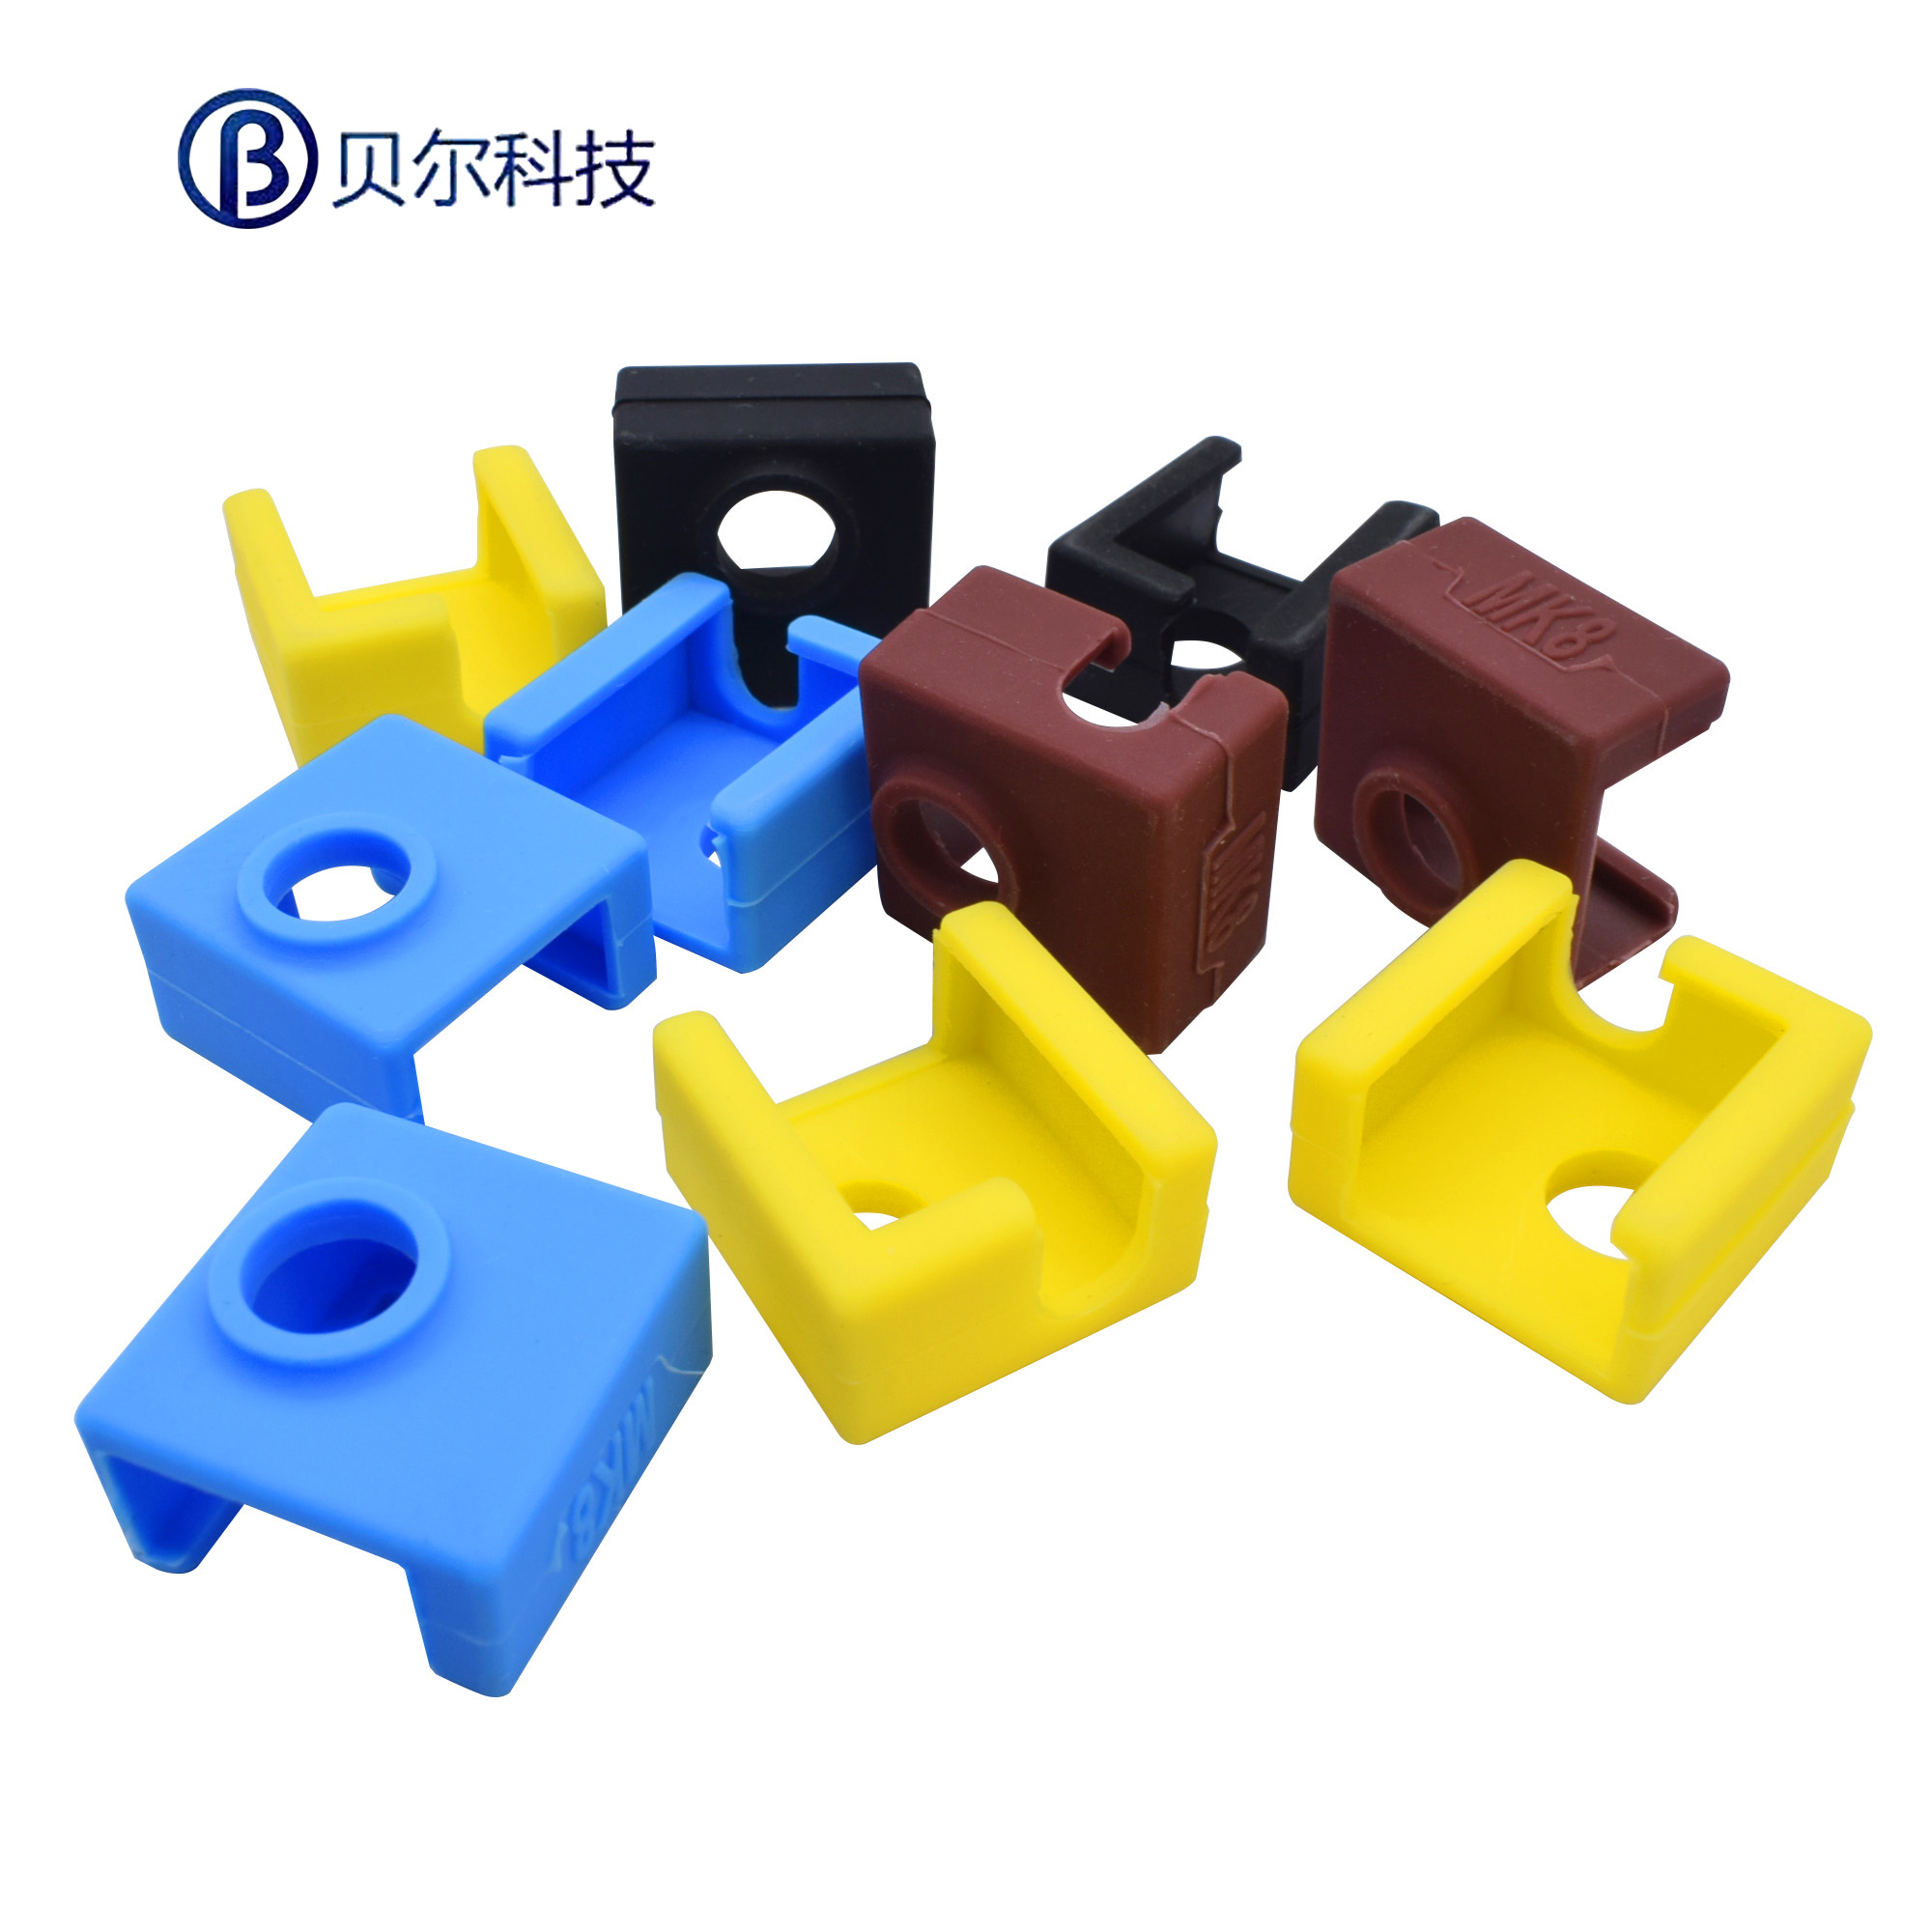 3D打印机配件 MK7/8/9 加热铝块硅胶套 耐高温达280℃ 带刻字